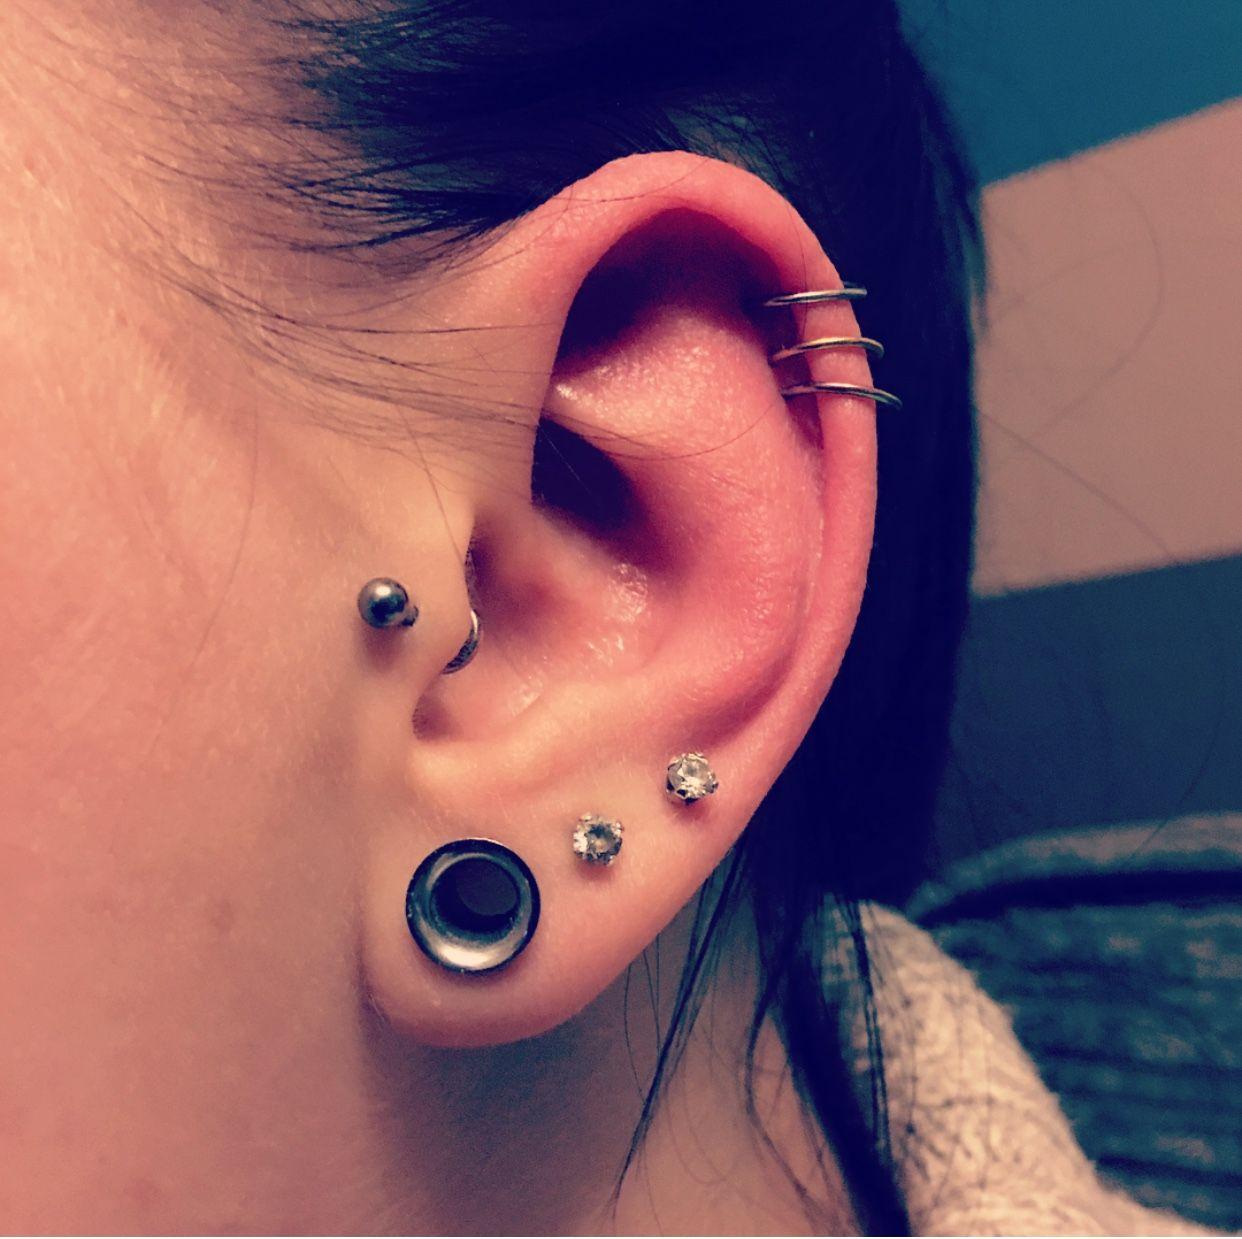 Triple helix piercing with tiny rings | Ear piercings ...